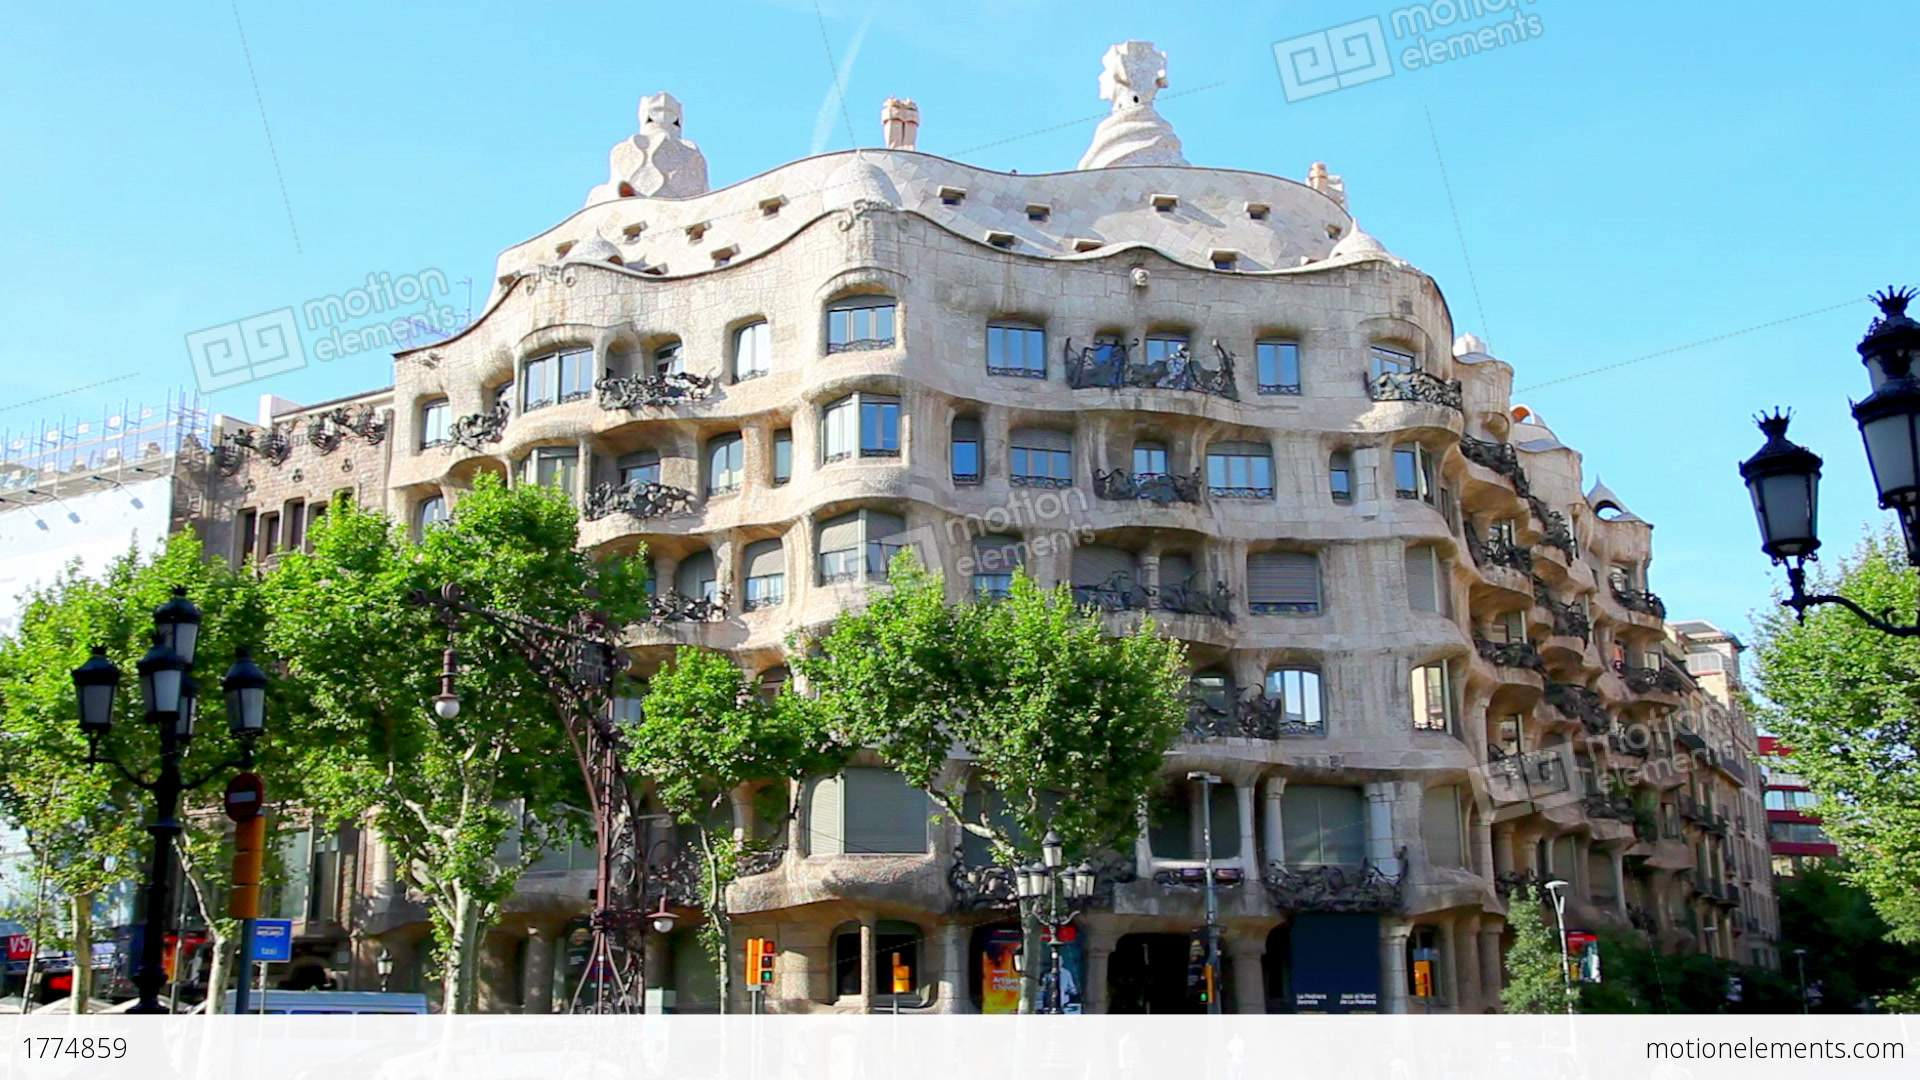 Casa Mila La Pedrera In Barcelona Spain Stock video footage  1774859